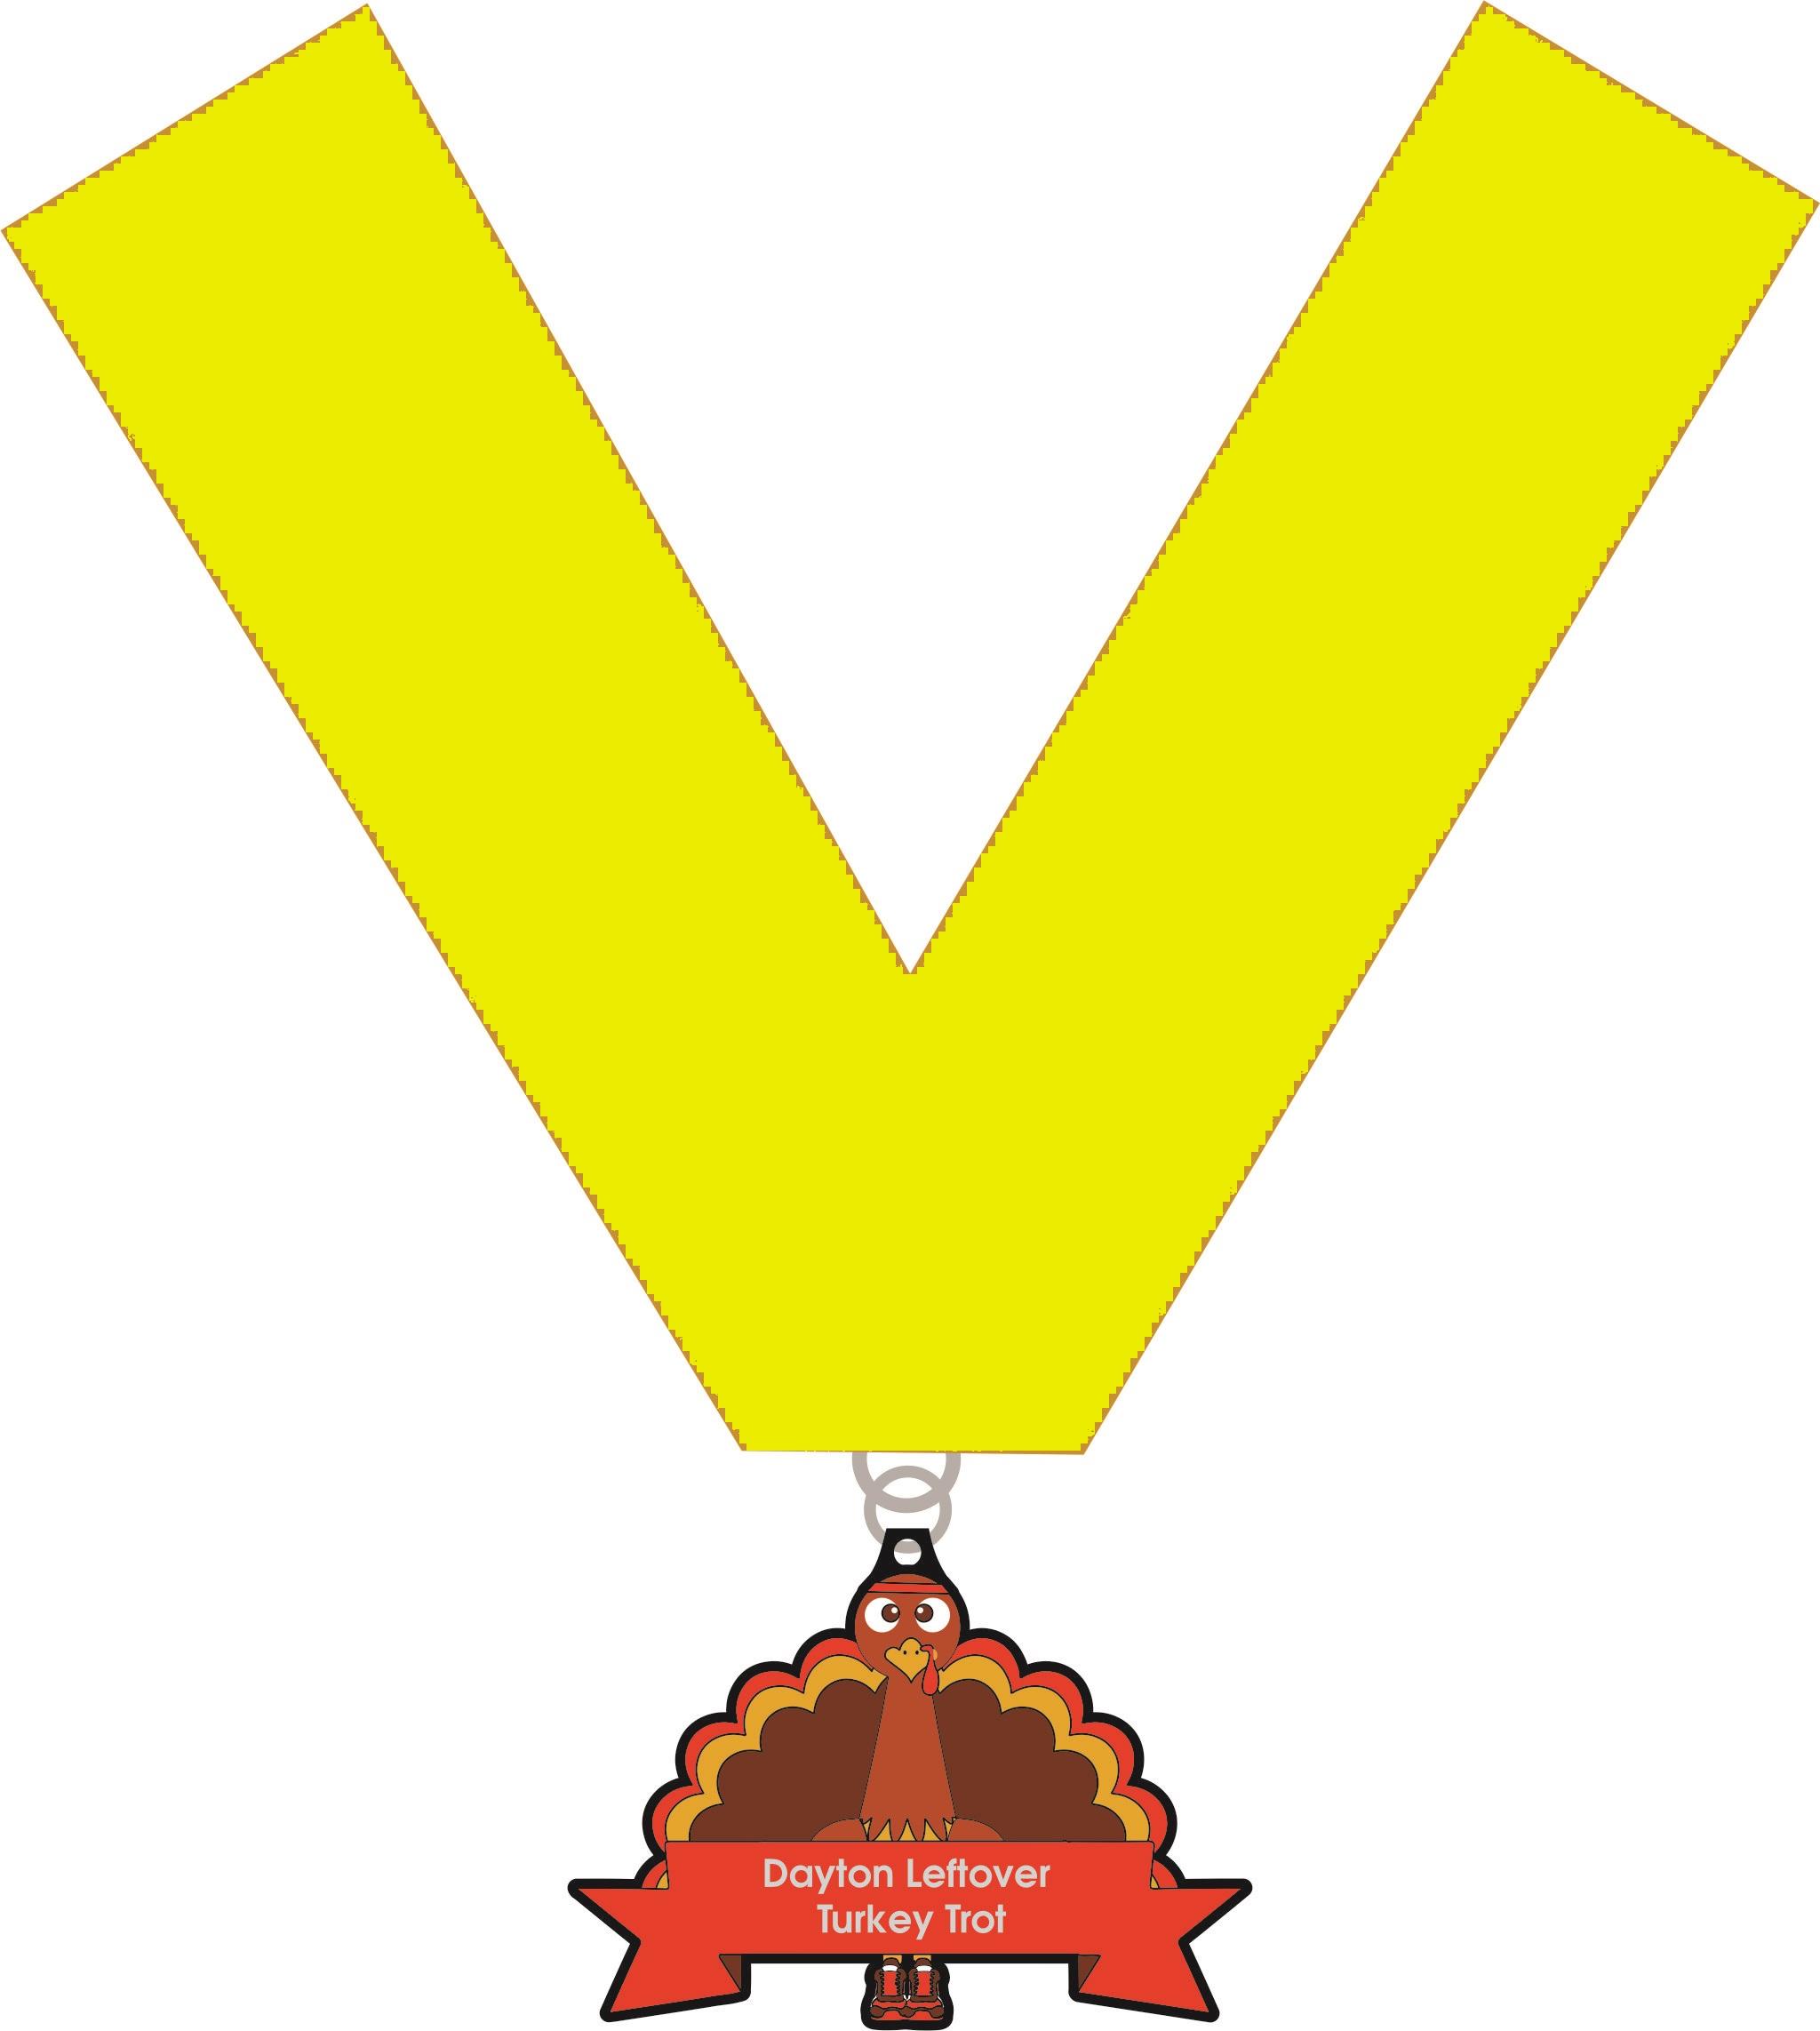 Dayton Leftover Turkey Trot Medal